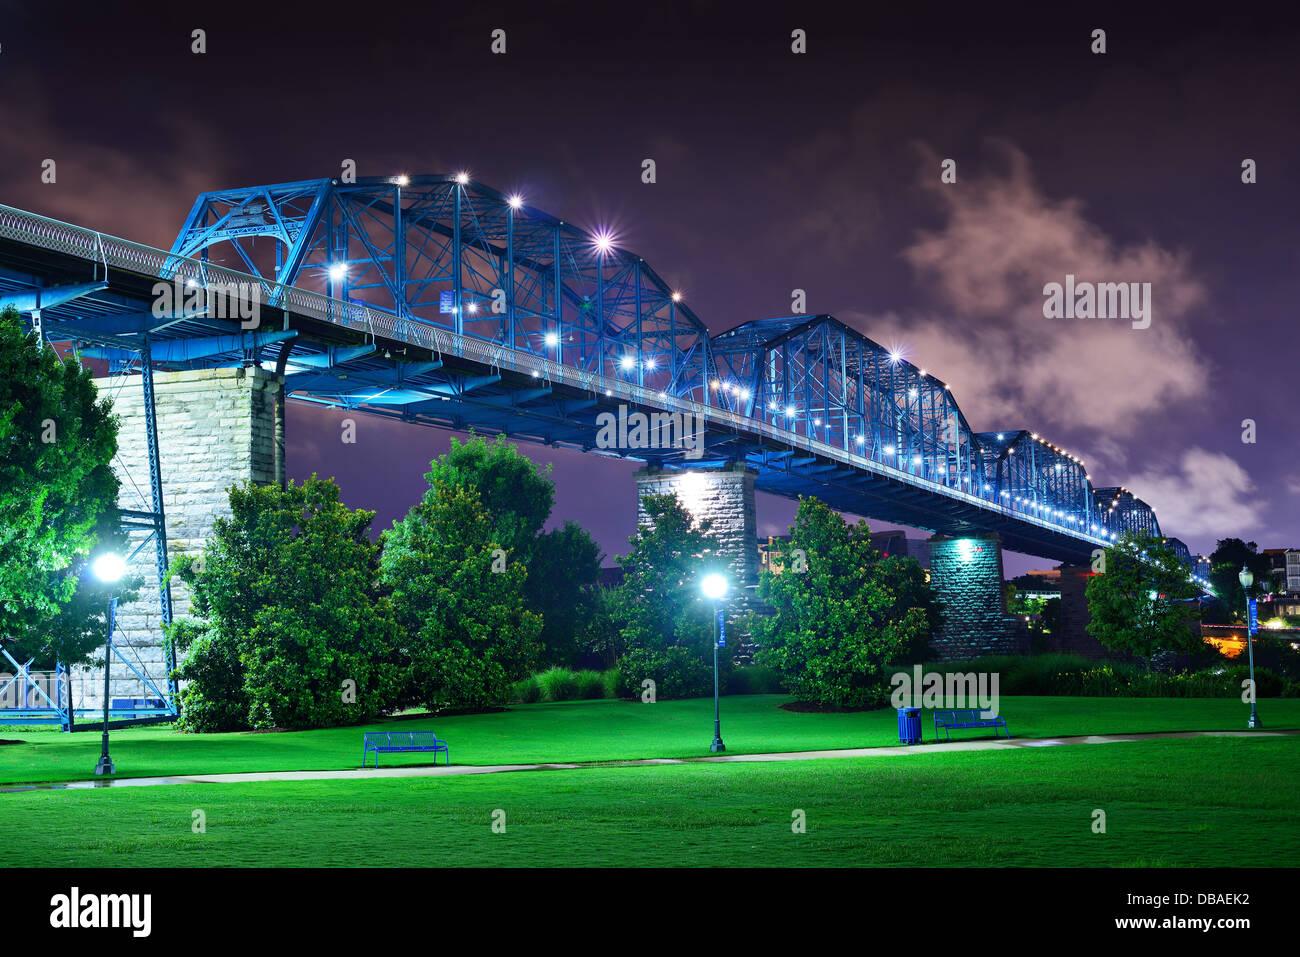 Walnut Street Bridge über Coolidge Park in Chattanooga, Tennessee. Stockbild